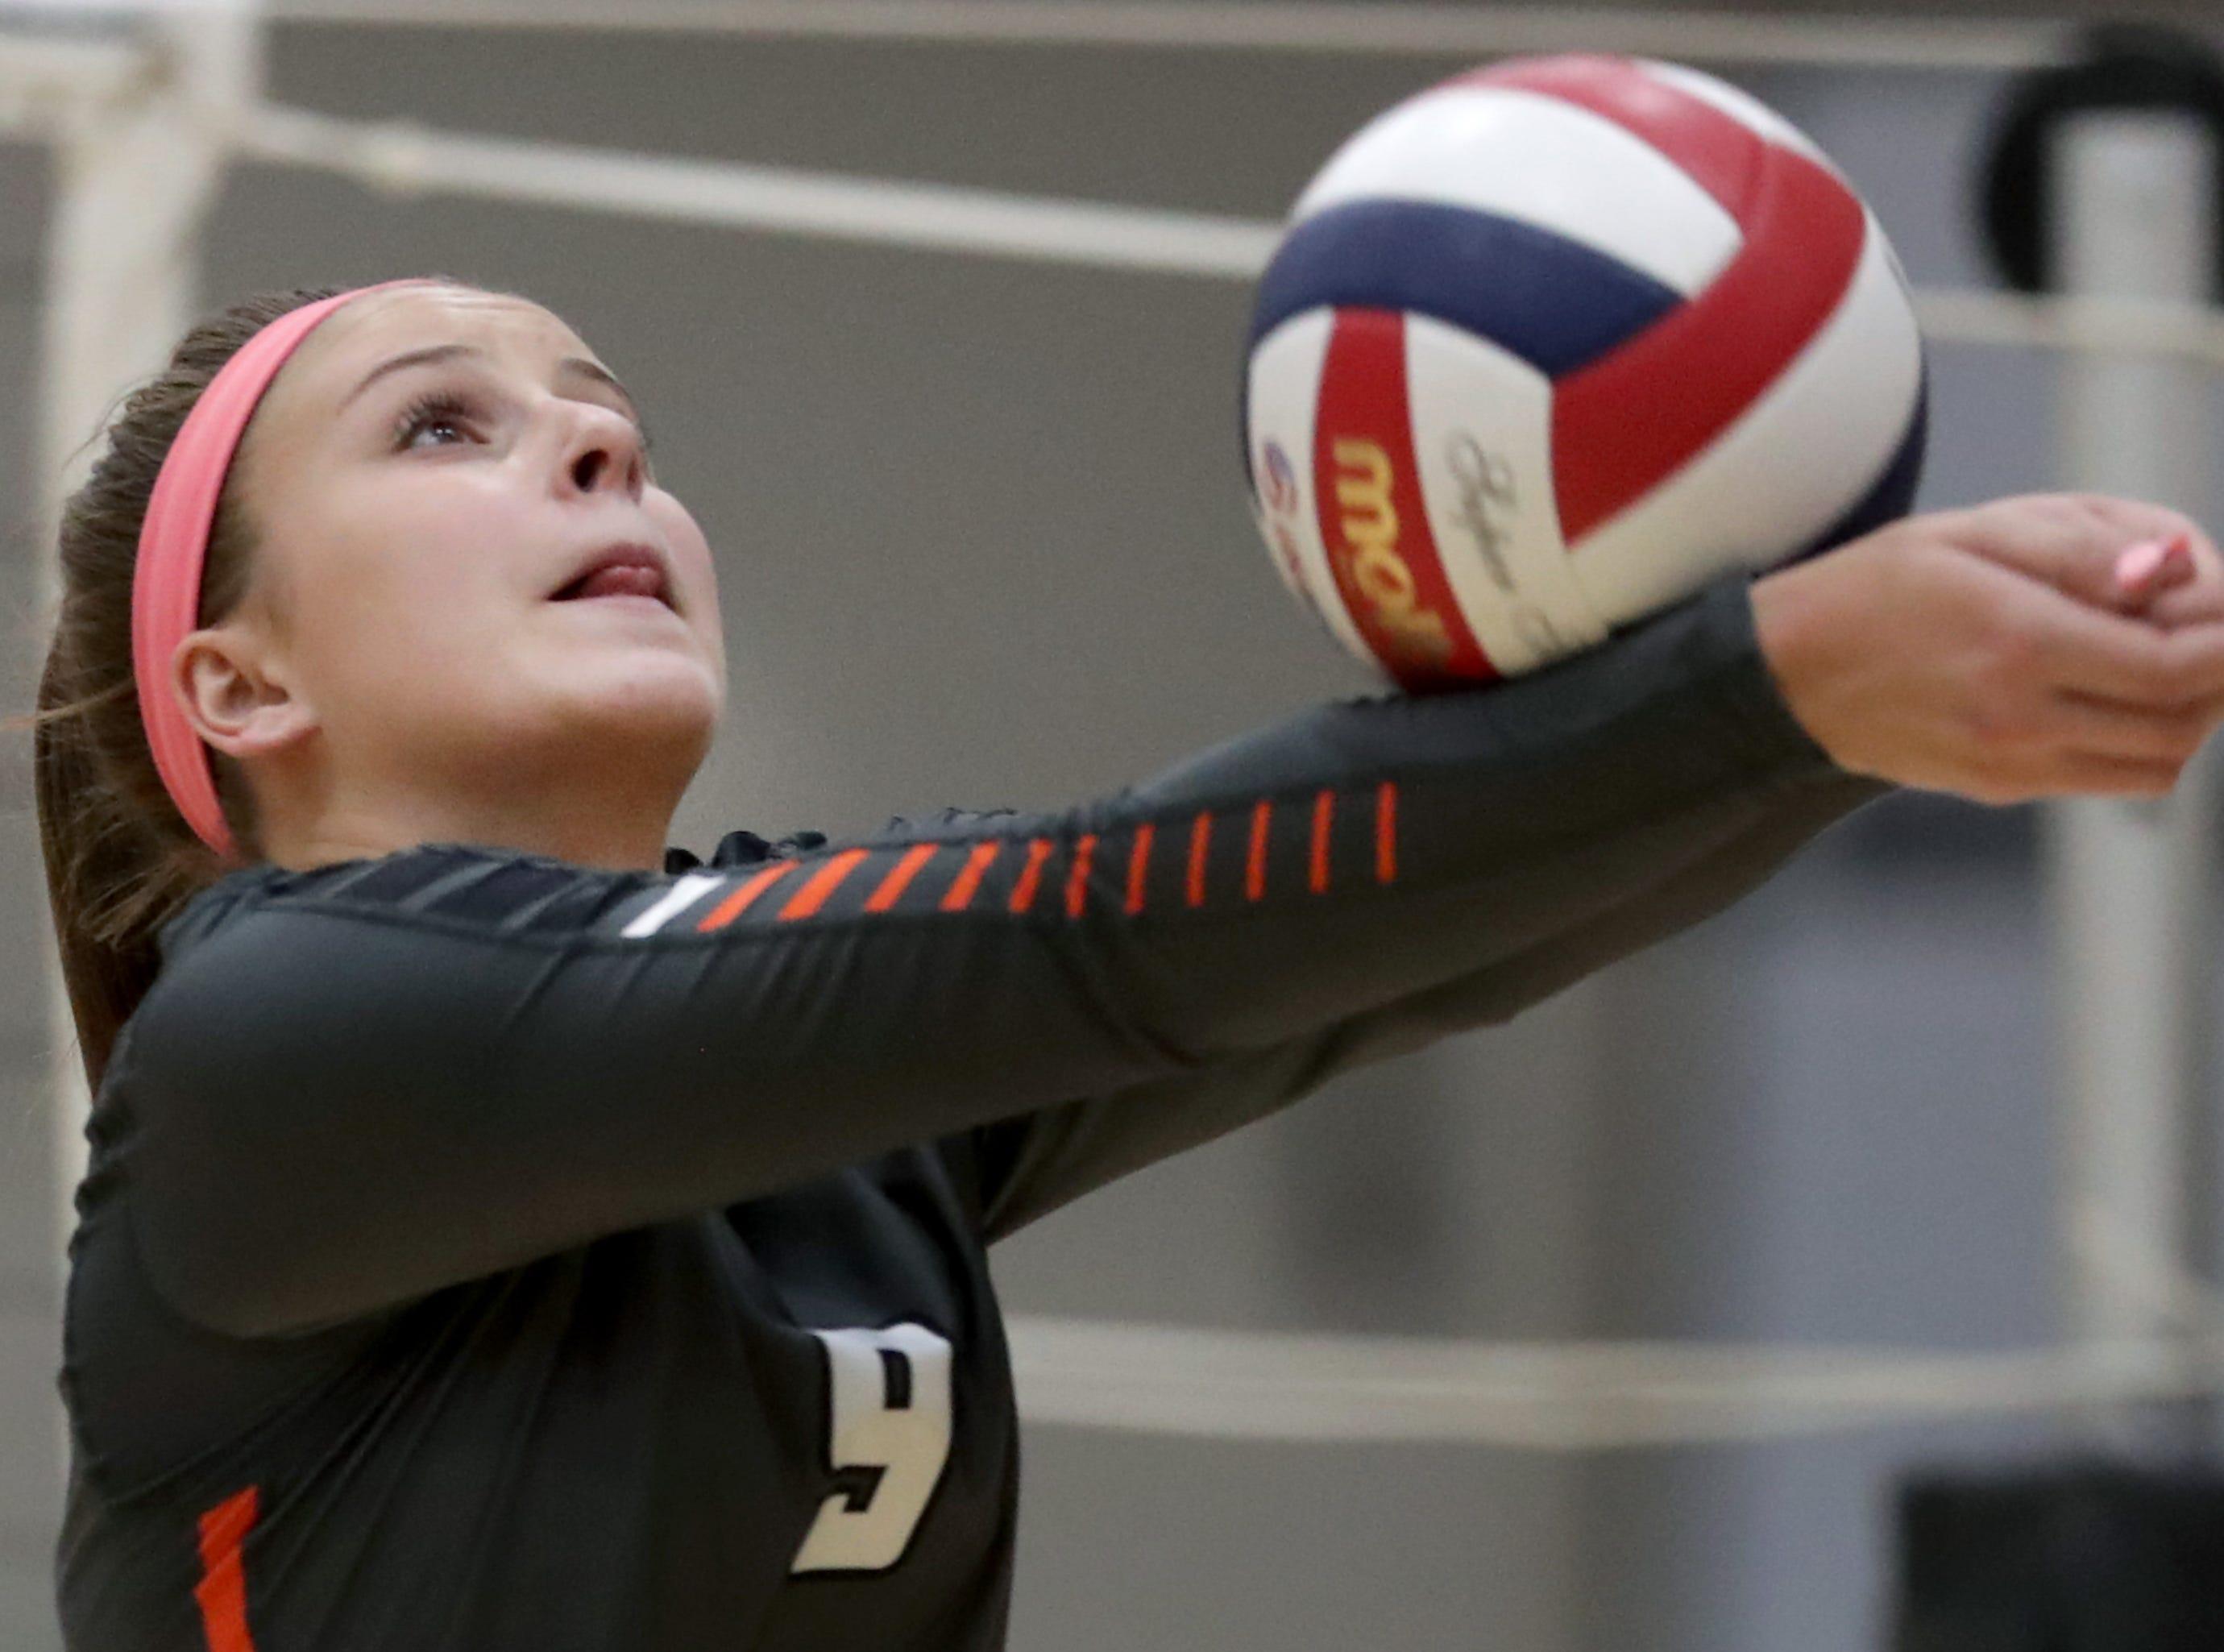 Kaukauna High School's #9 Morgan Zwick against Appleton East High School during their girls volleyball game on Thursday, October 11, 2018, in Kaukauna, Wis. Wm. Glasheen/USA TODAY NETWORK-Wisconsin.